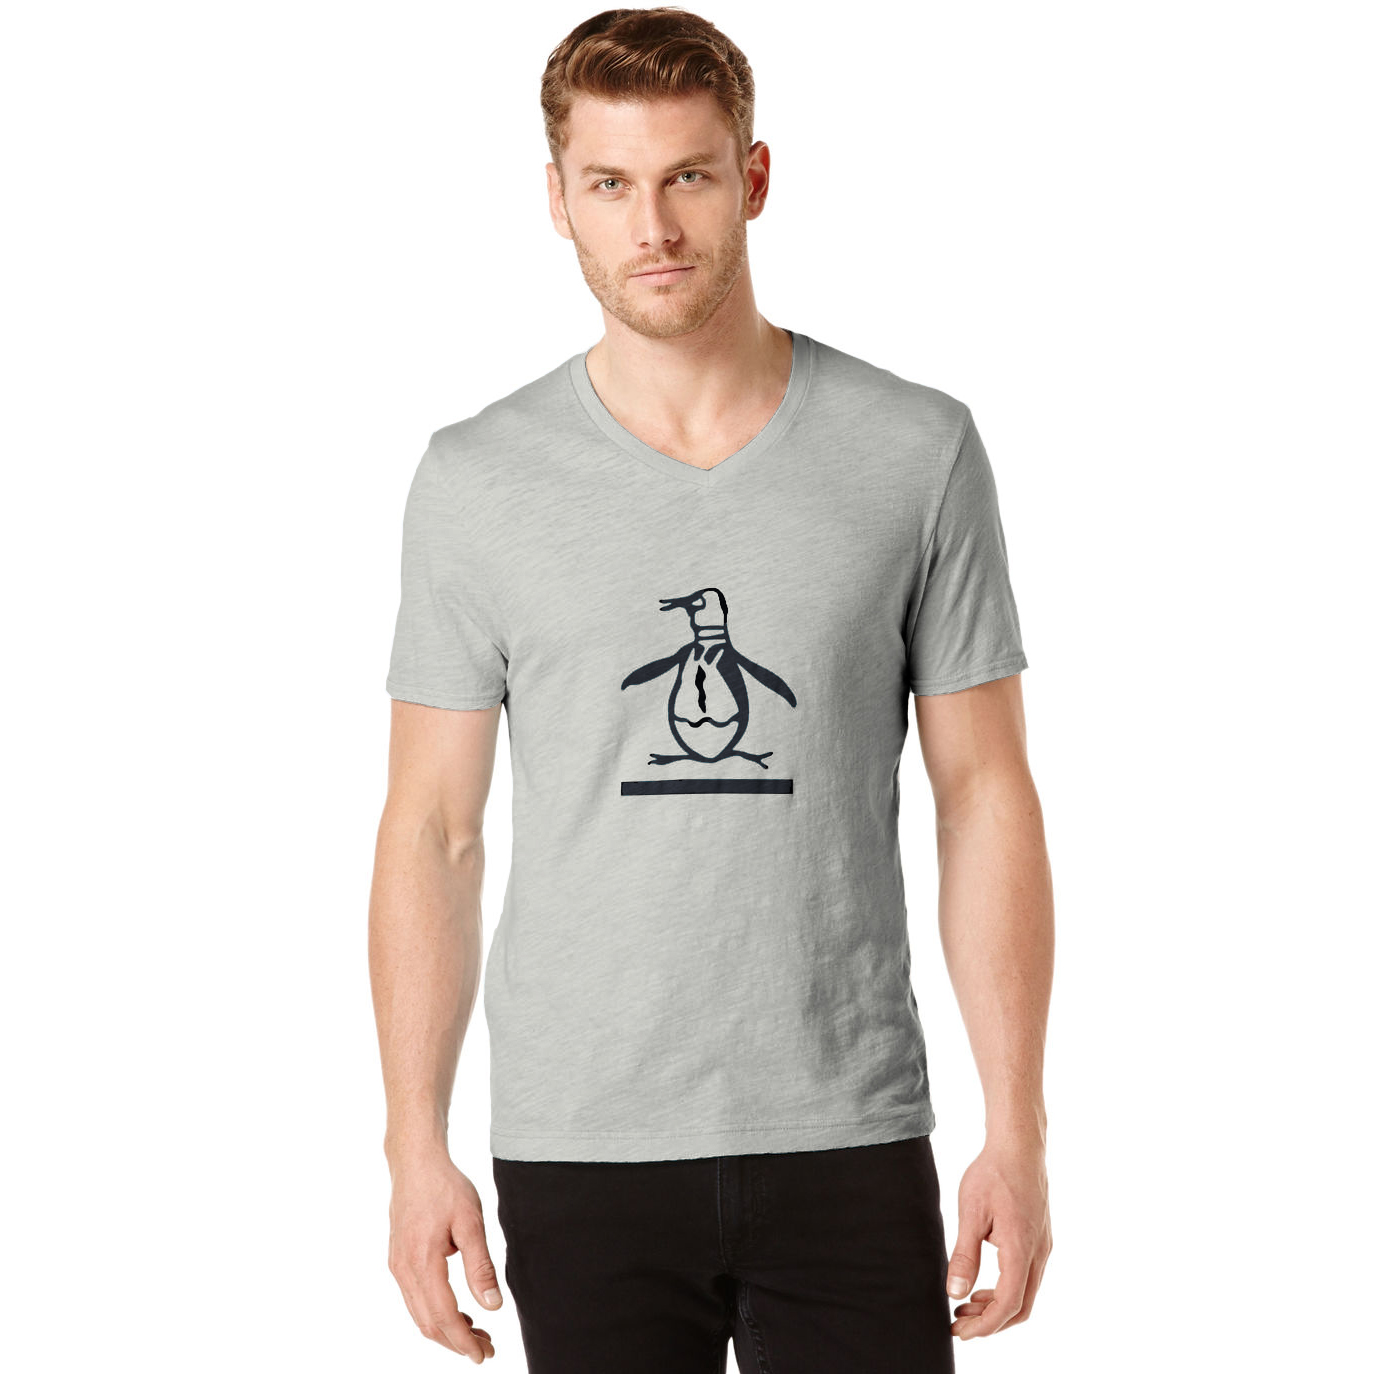 美國百分百【Penguin by Munsingwear】企鵝 男 T-shirt 灰色 V領 T恤 短袖 S E952